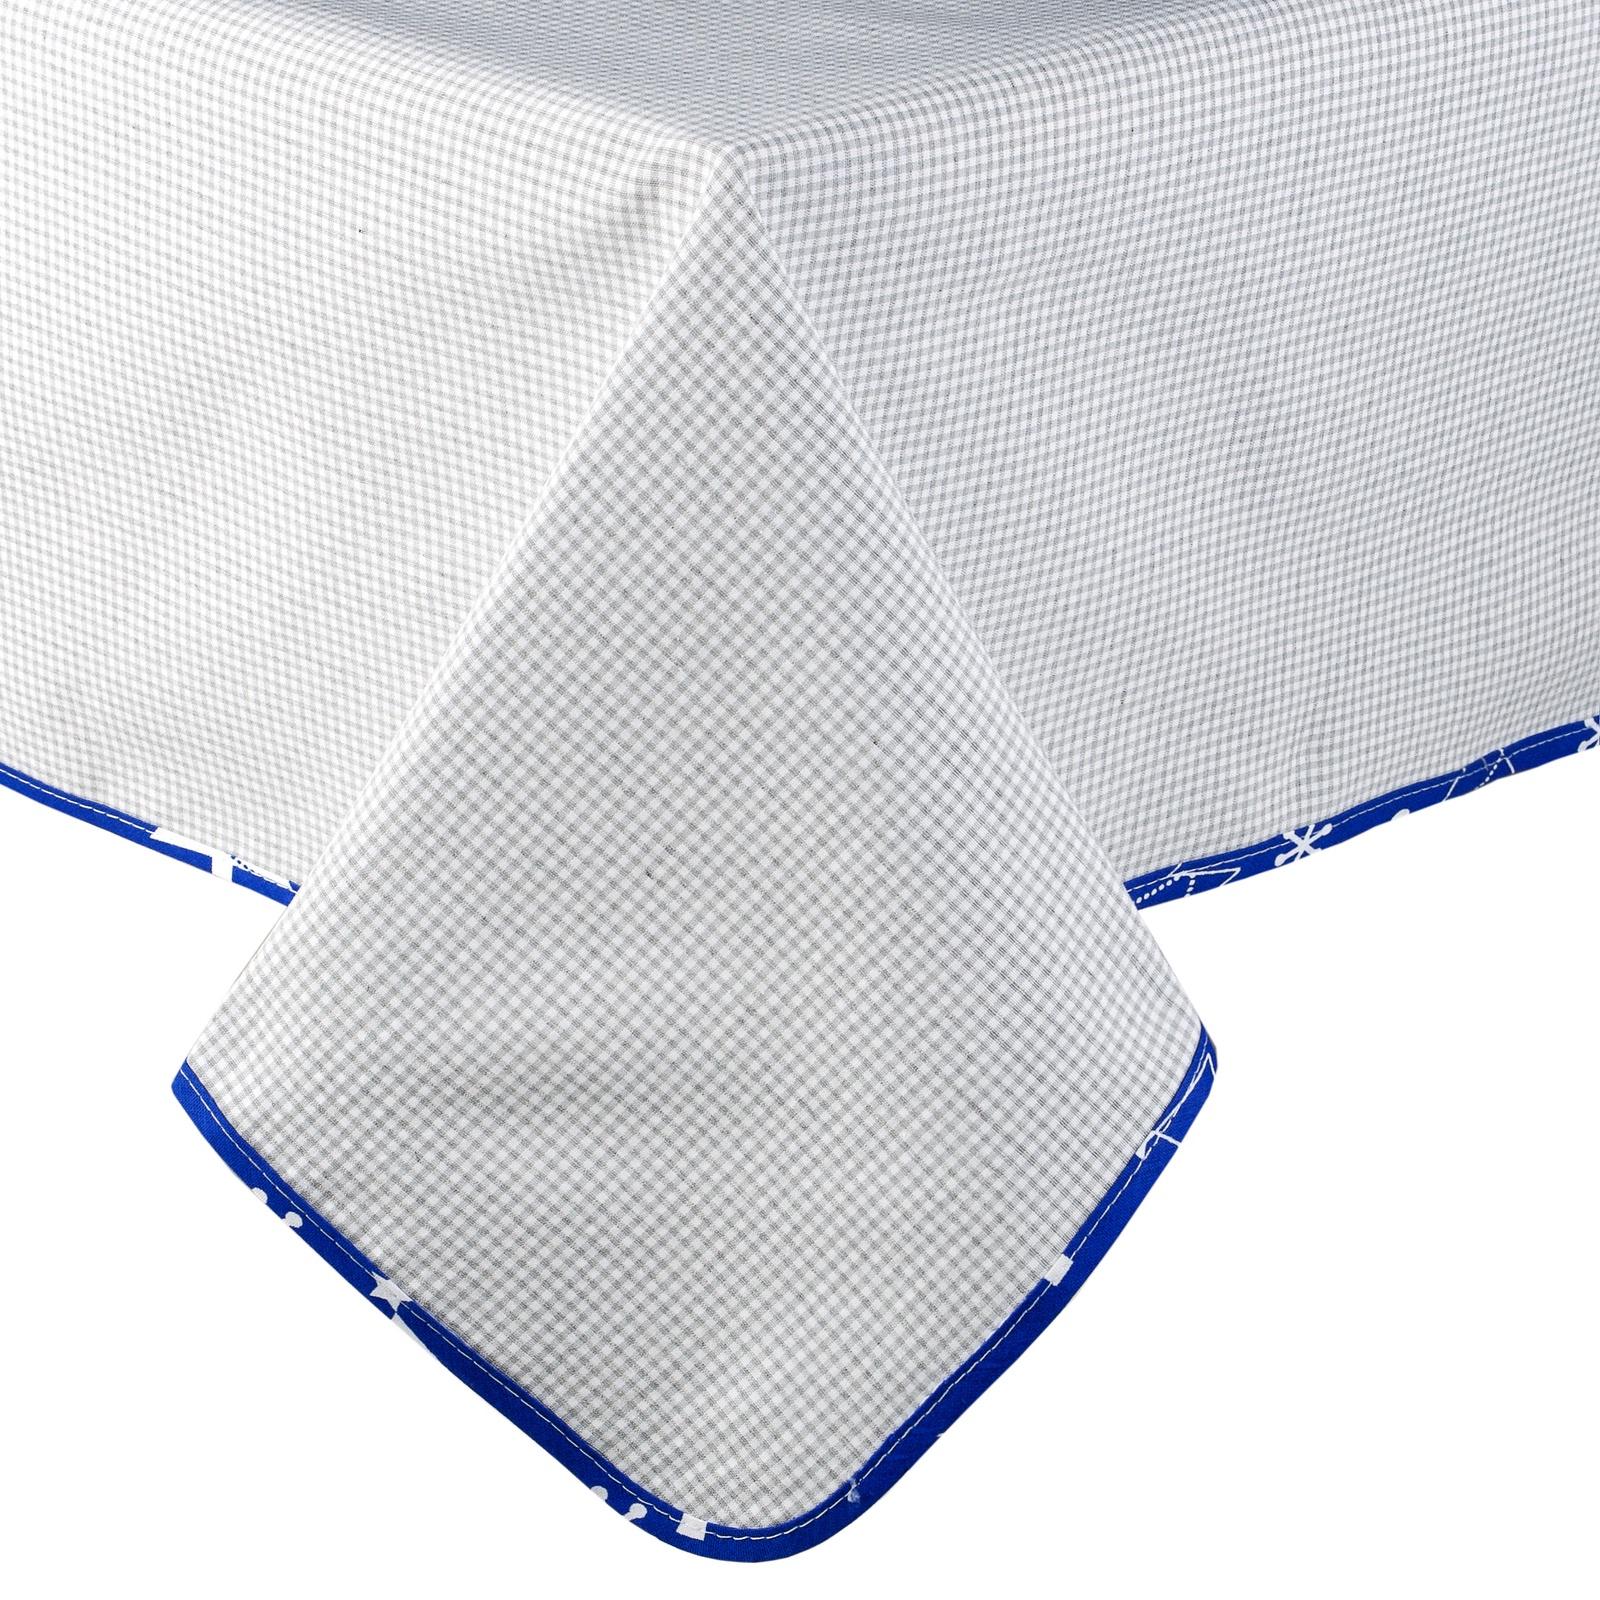 "Скатерть Традиция ""Лофт"", 2053/Синий, серый, синий, 145 х 145 см"